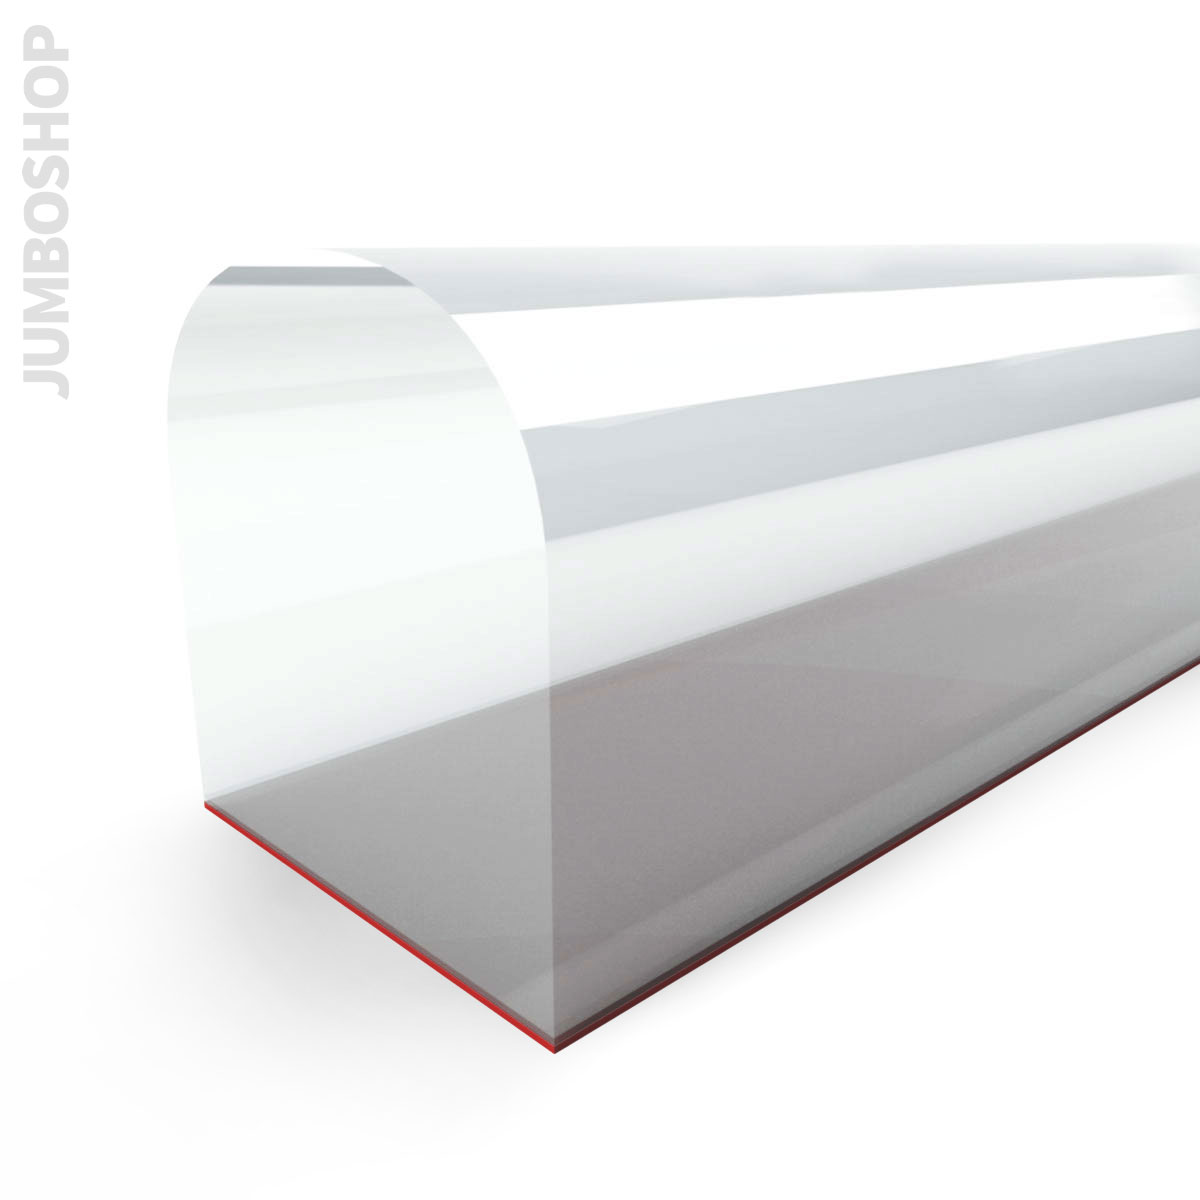 schwallschutz acryl halbrundstab spritzschutzprofil. Black Bedroom Furniture Sets. Home Design Ideas